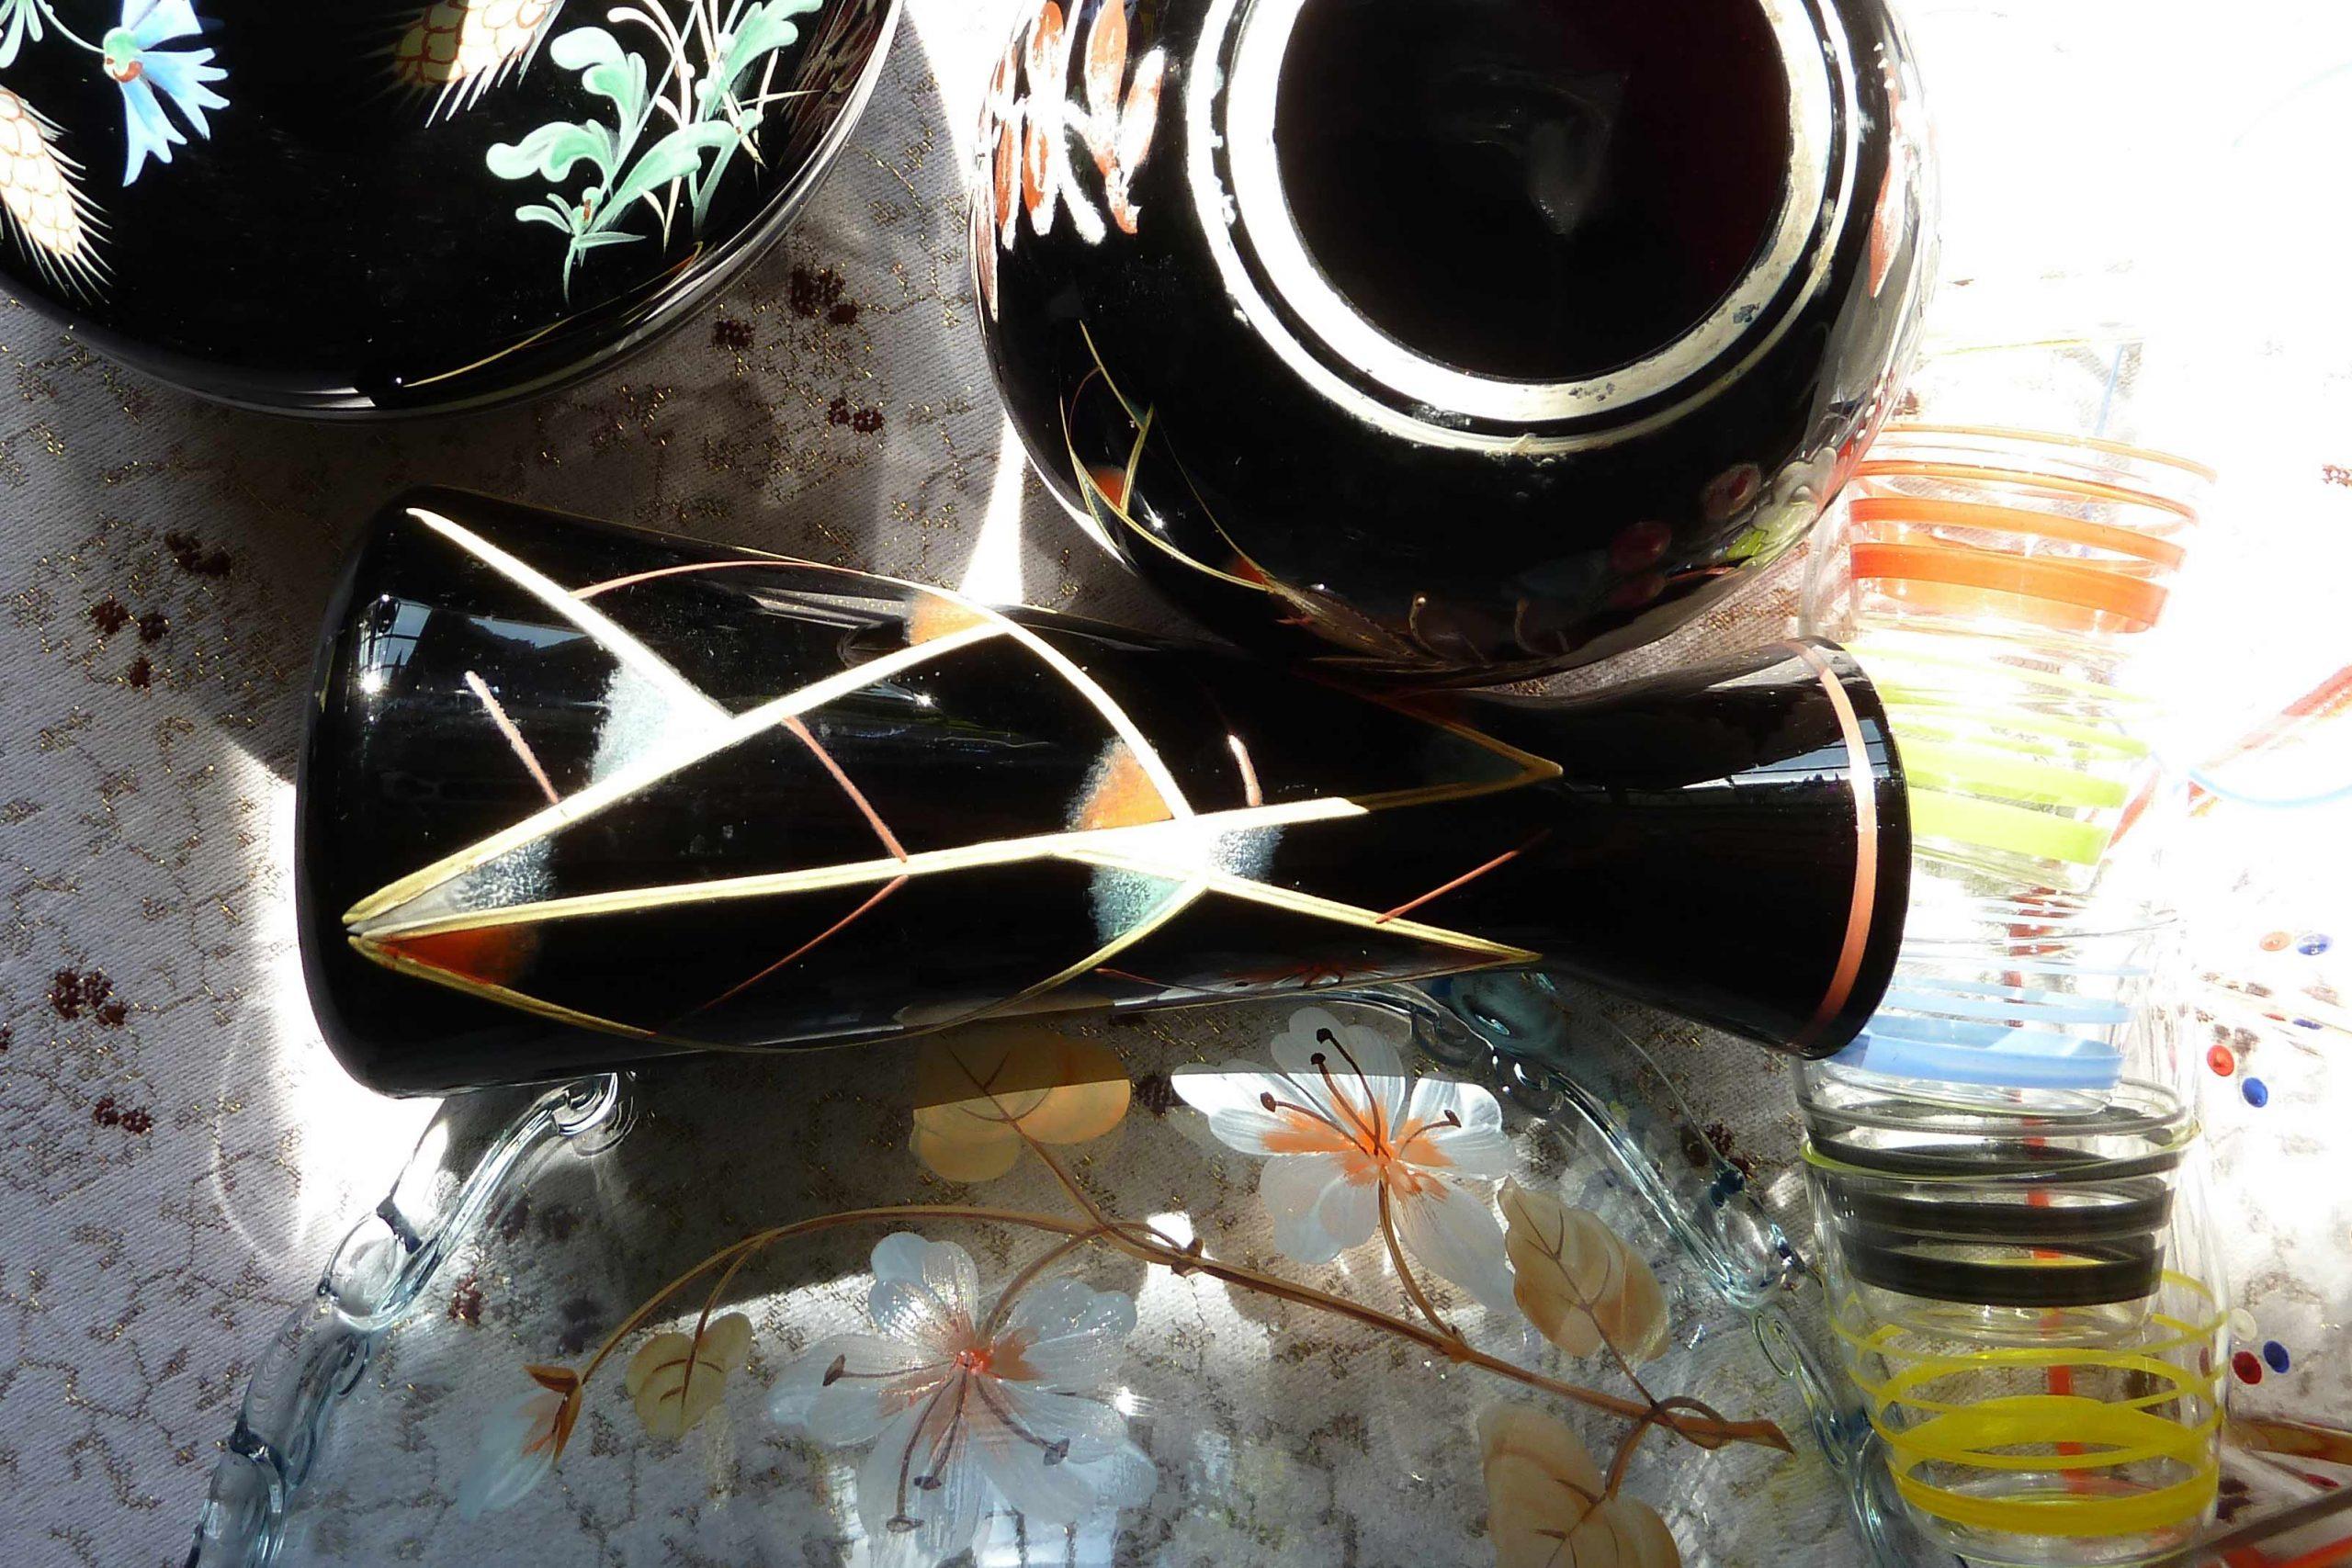 morris slow design schwarze glasvasen